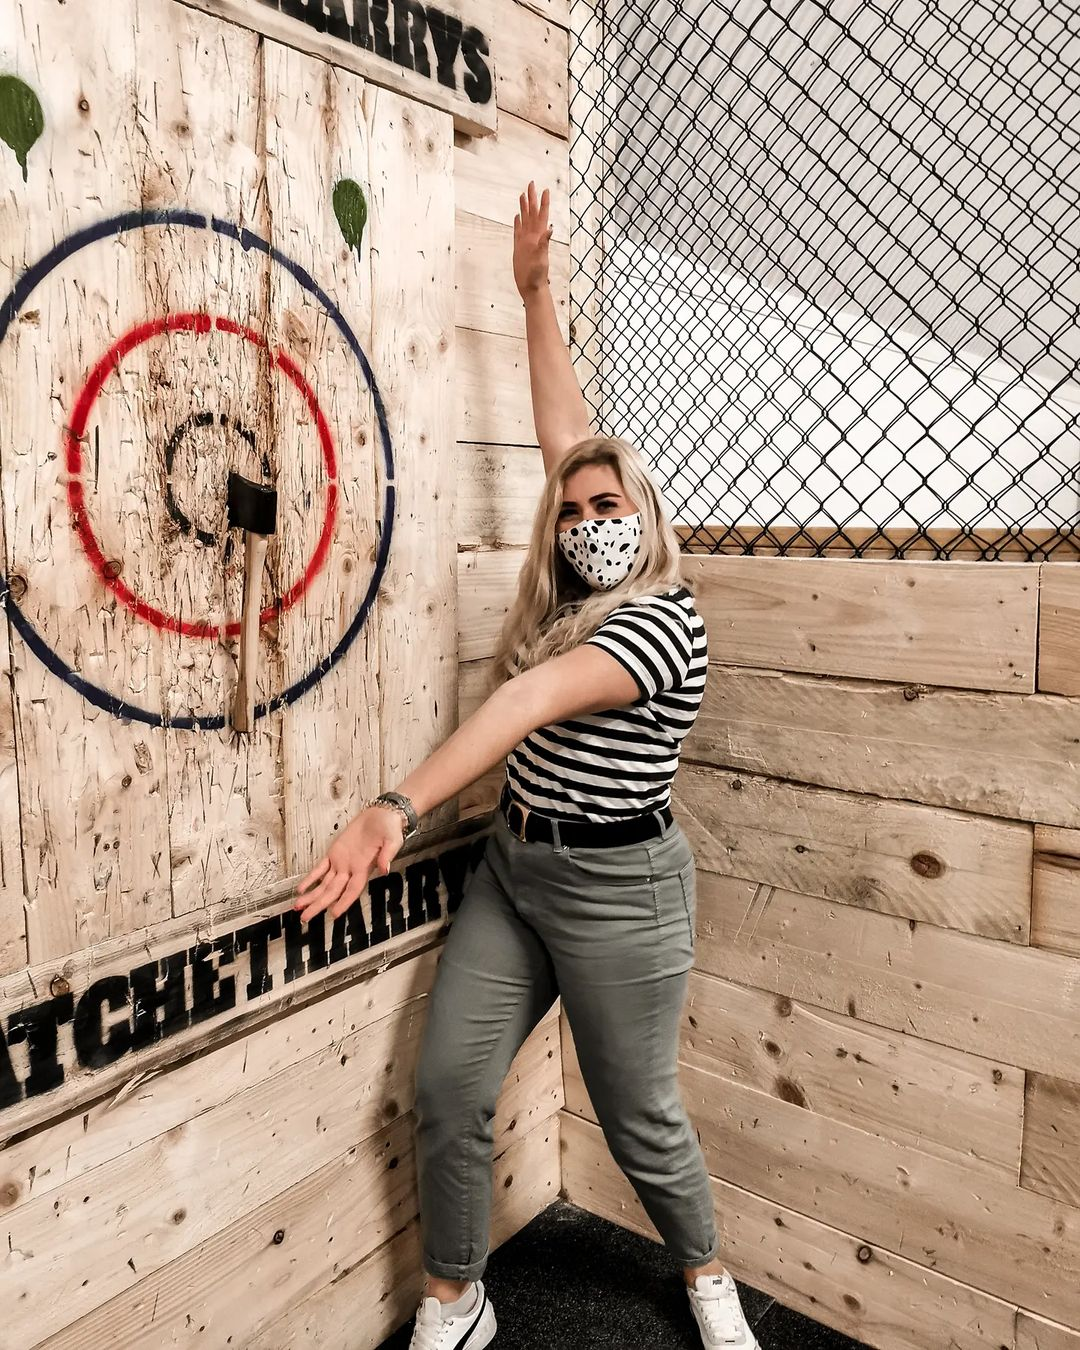 Holly showing off bullseye shot